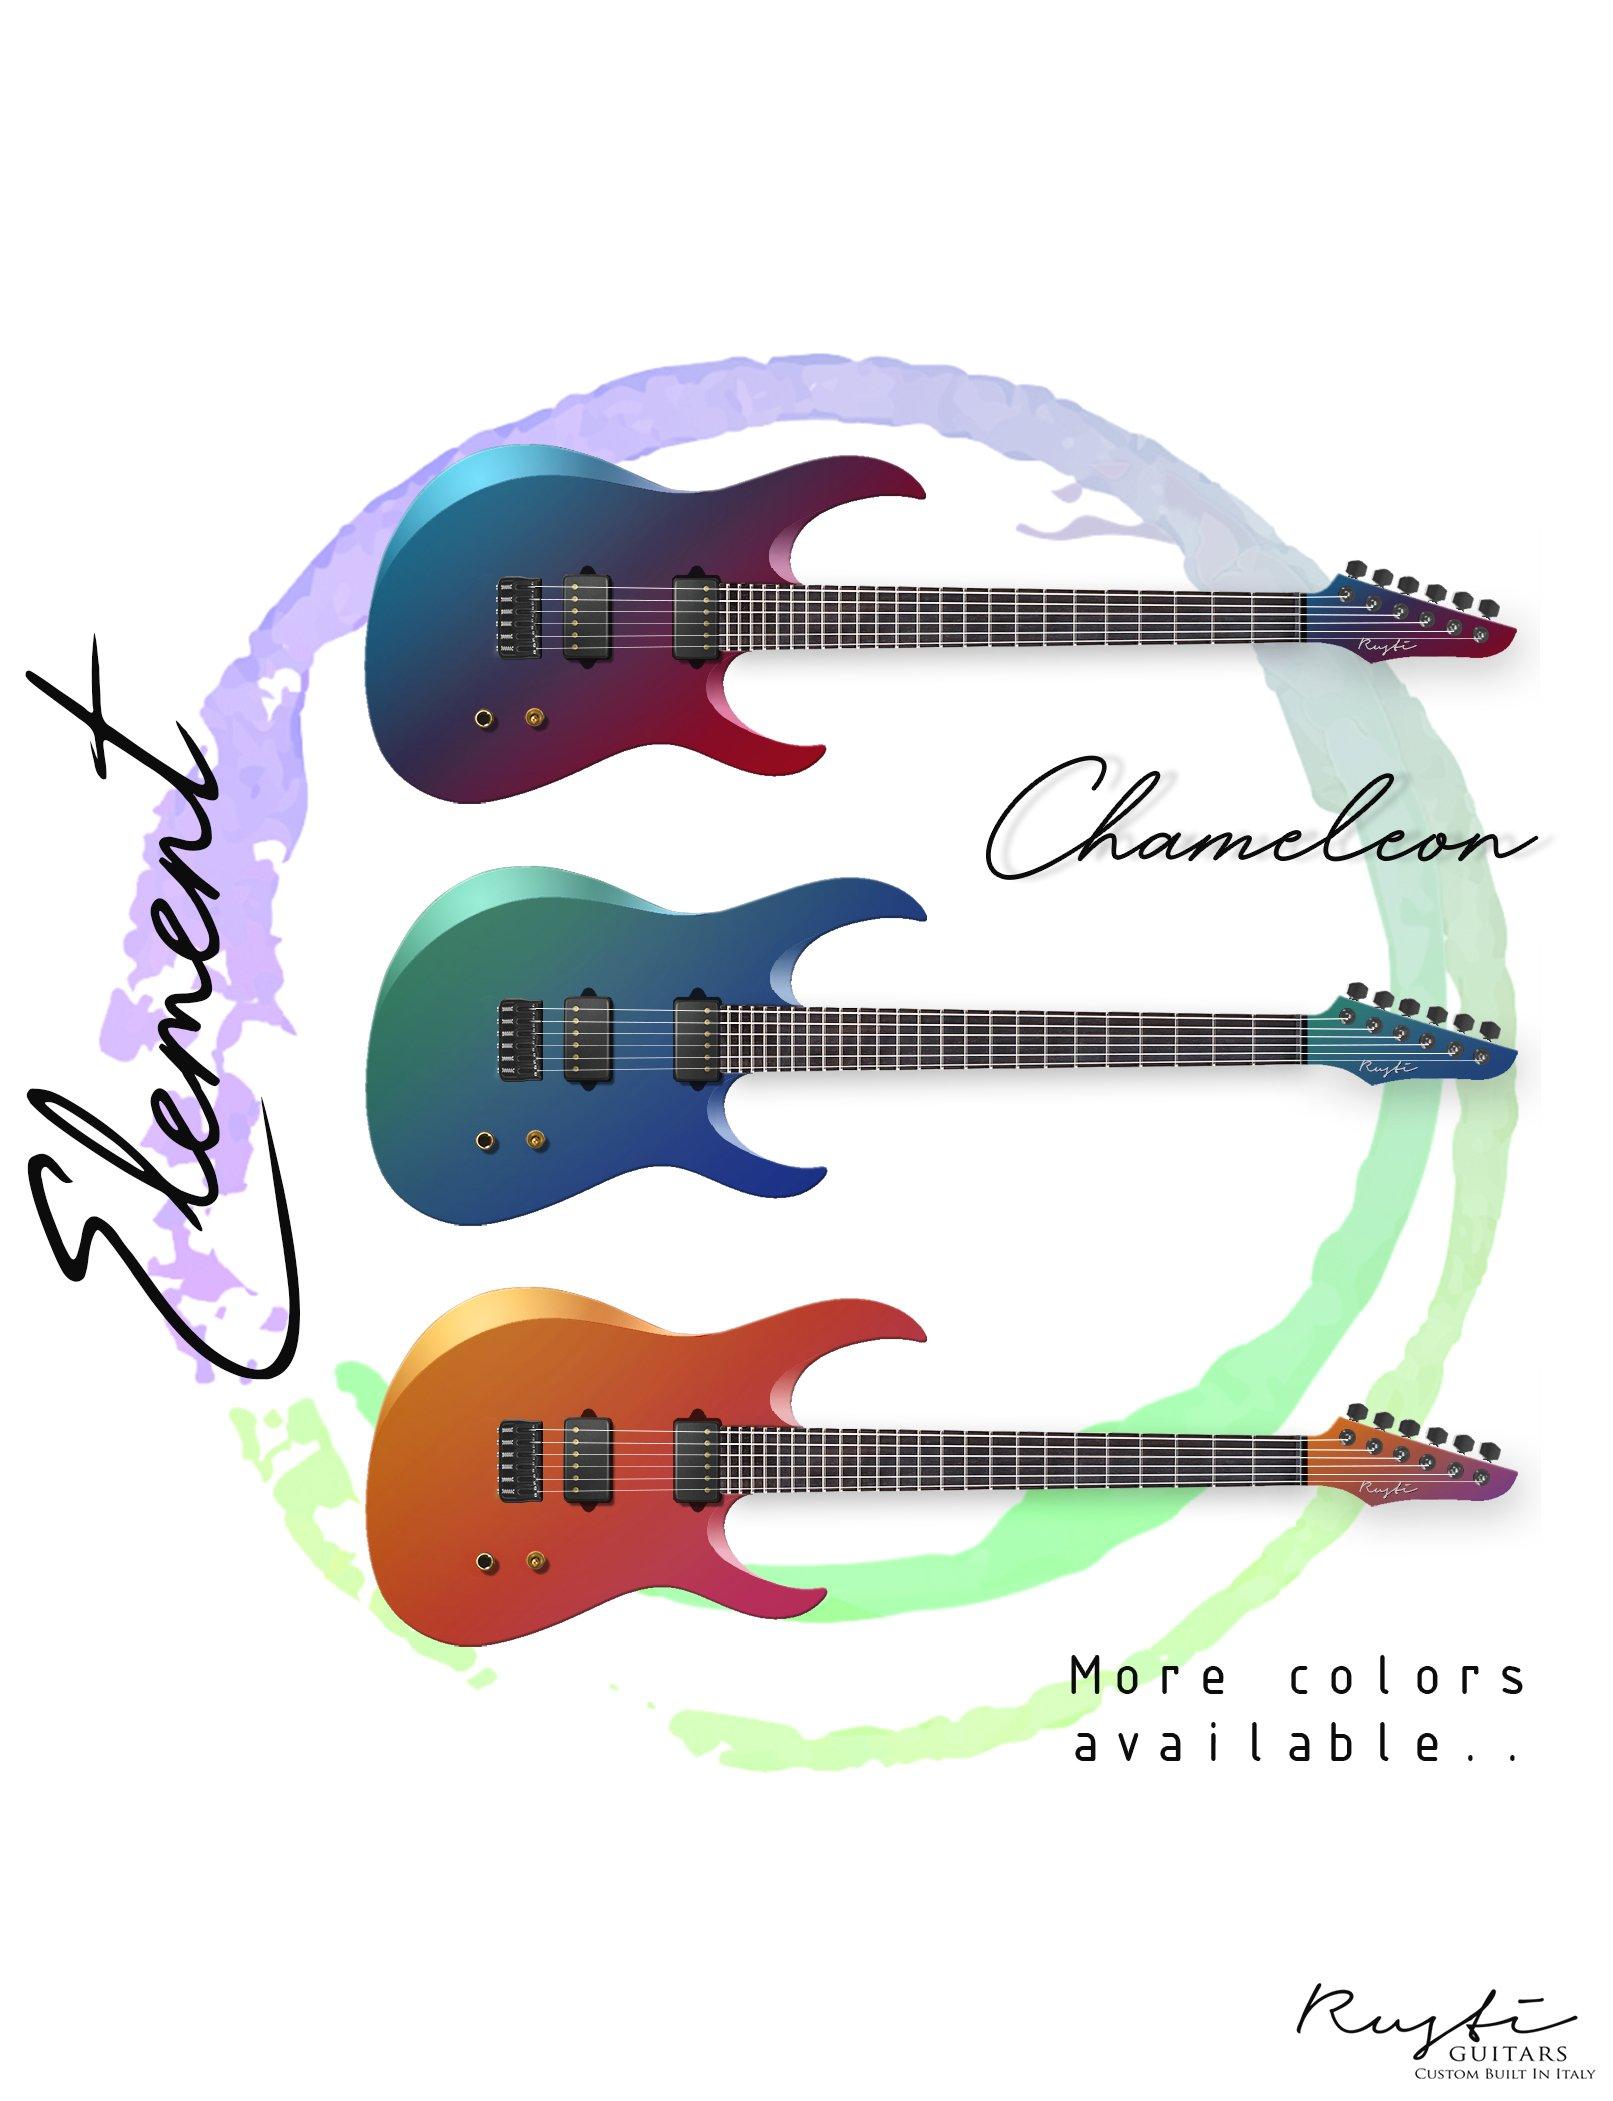 Element Chameleon rusti guitars rustiguitars custom guitars